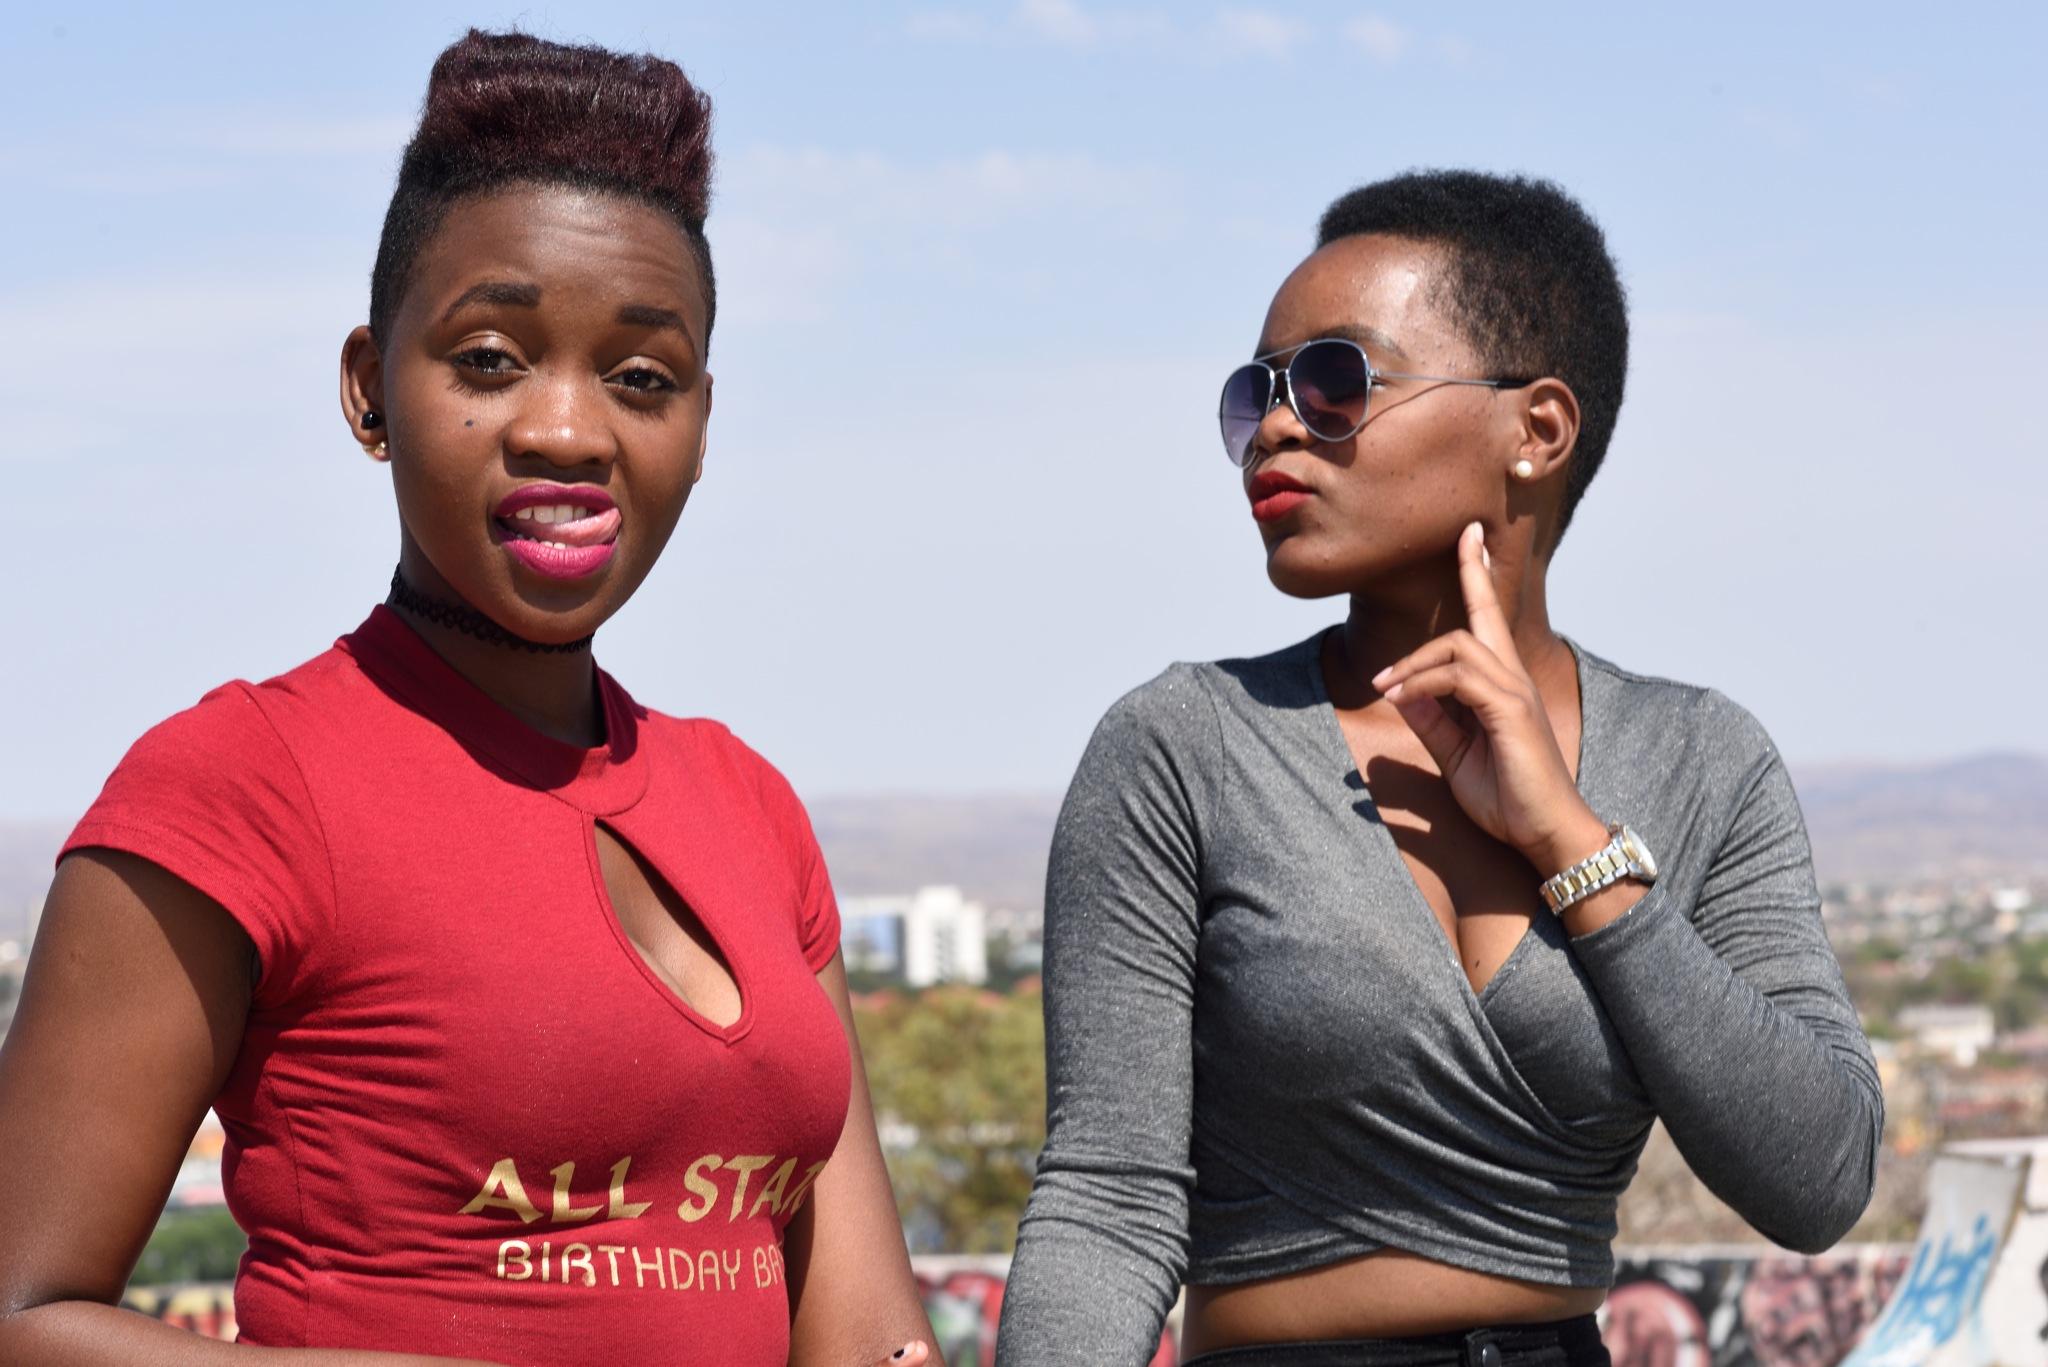 Namibian girls by Alplata